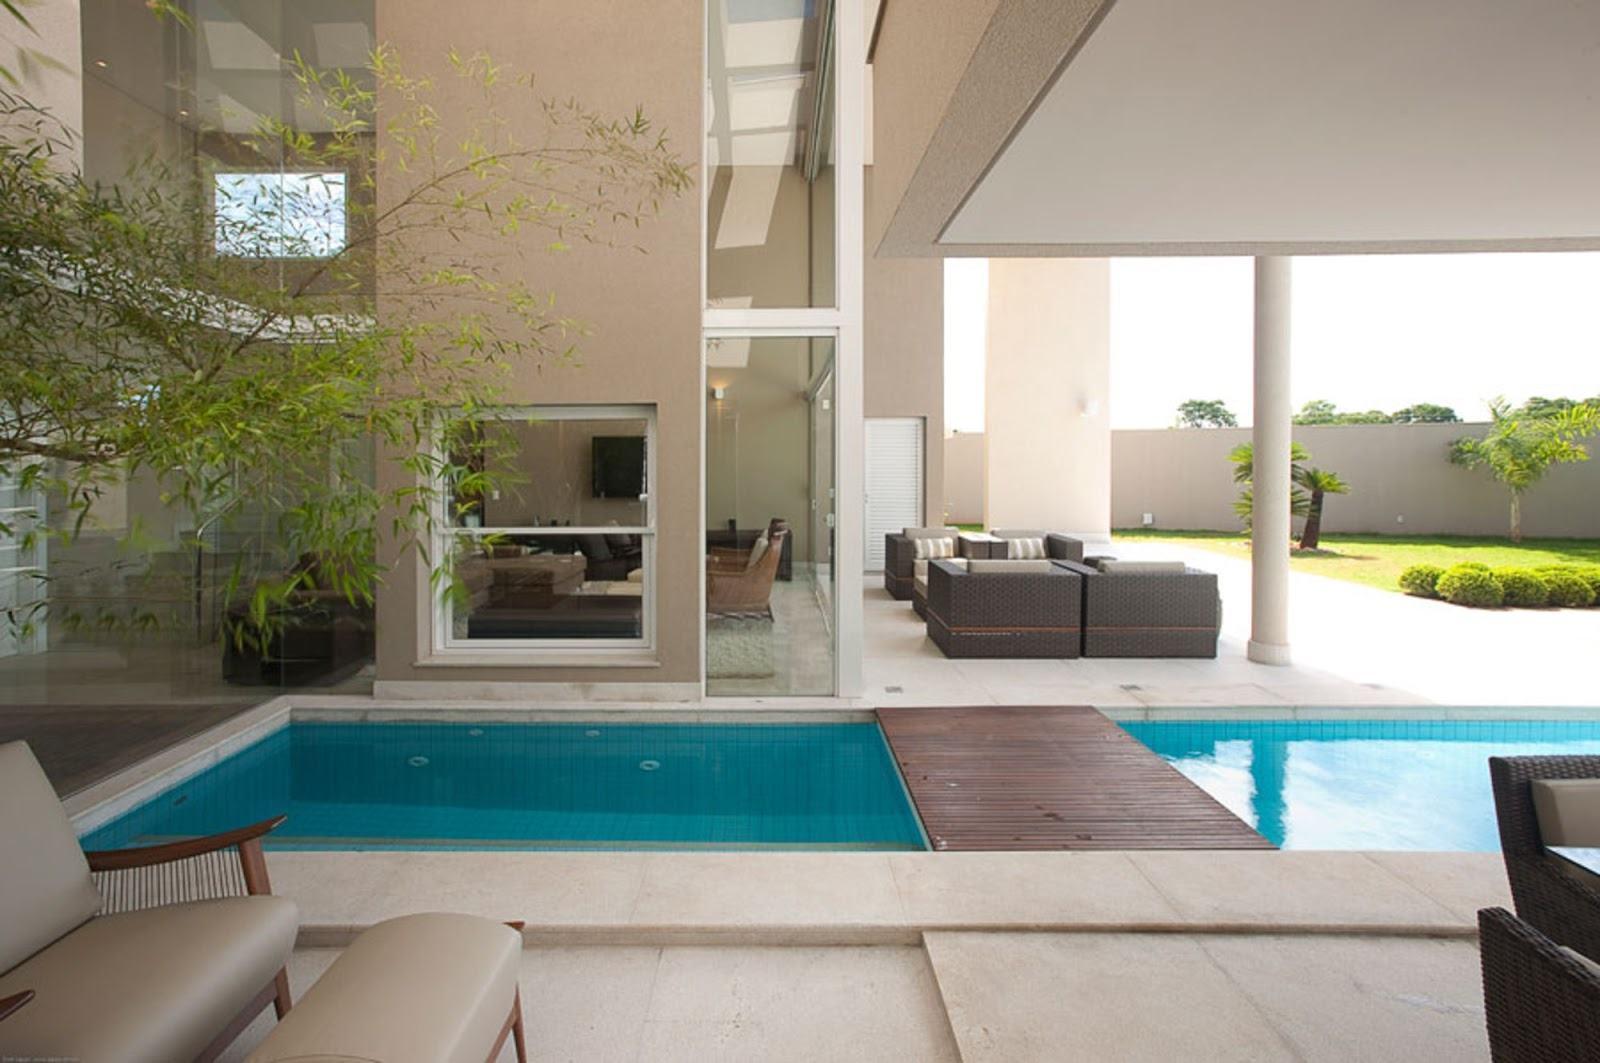 Casas com piscinas 60 modelos projetos e fotos for Fotos de casas de campo con piscina